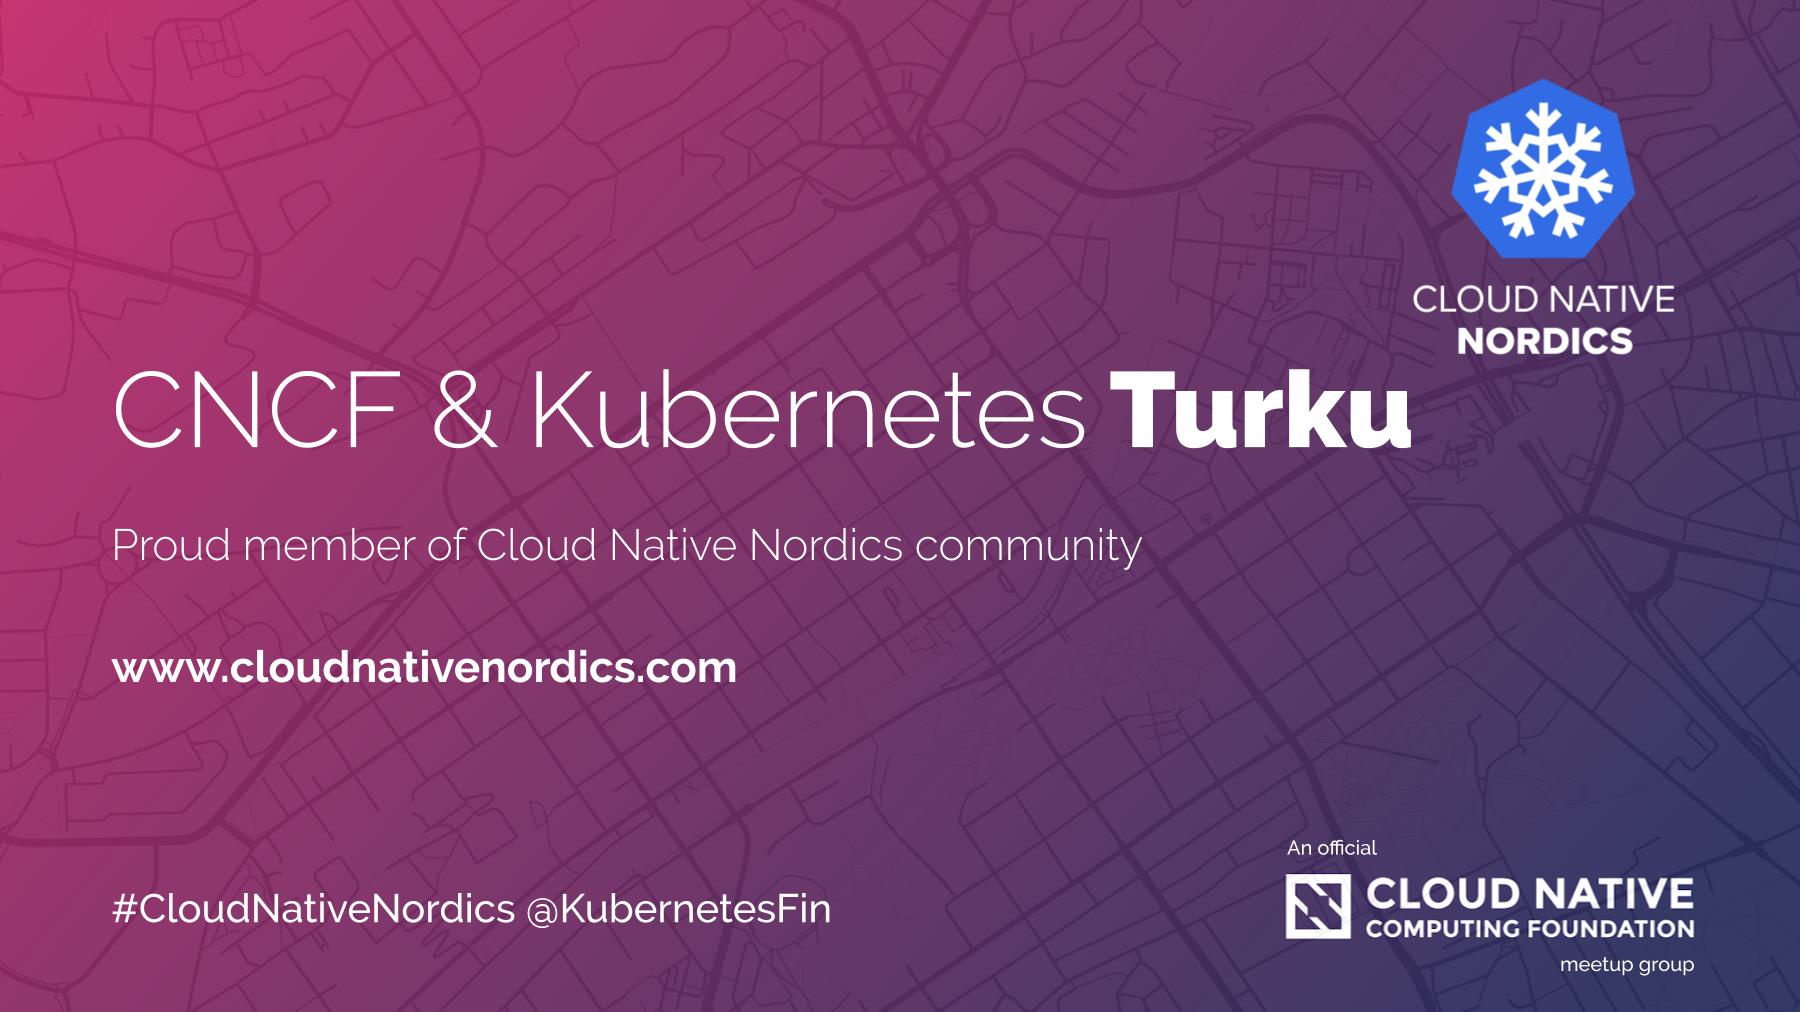 Kubernetes and CNCF Turku Meetup